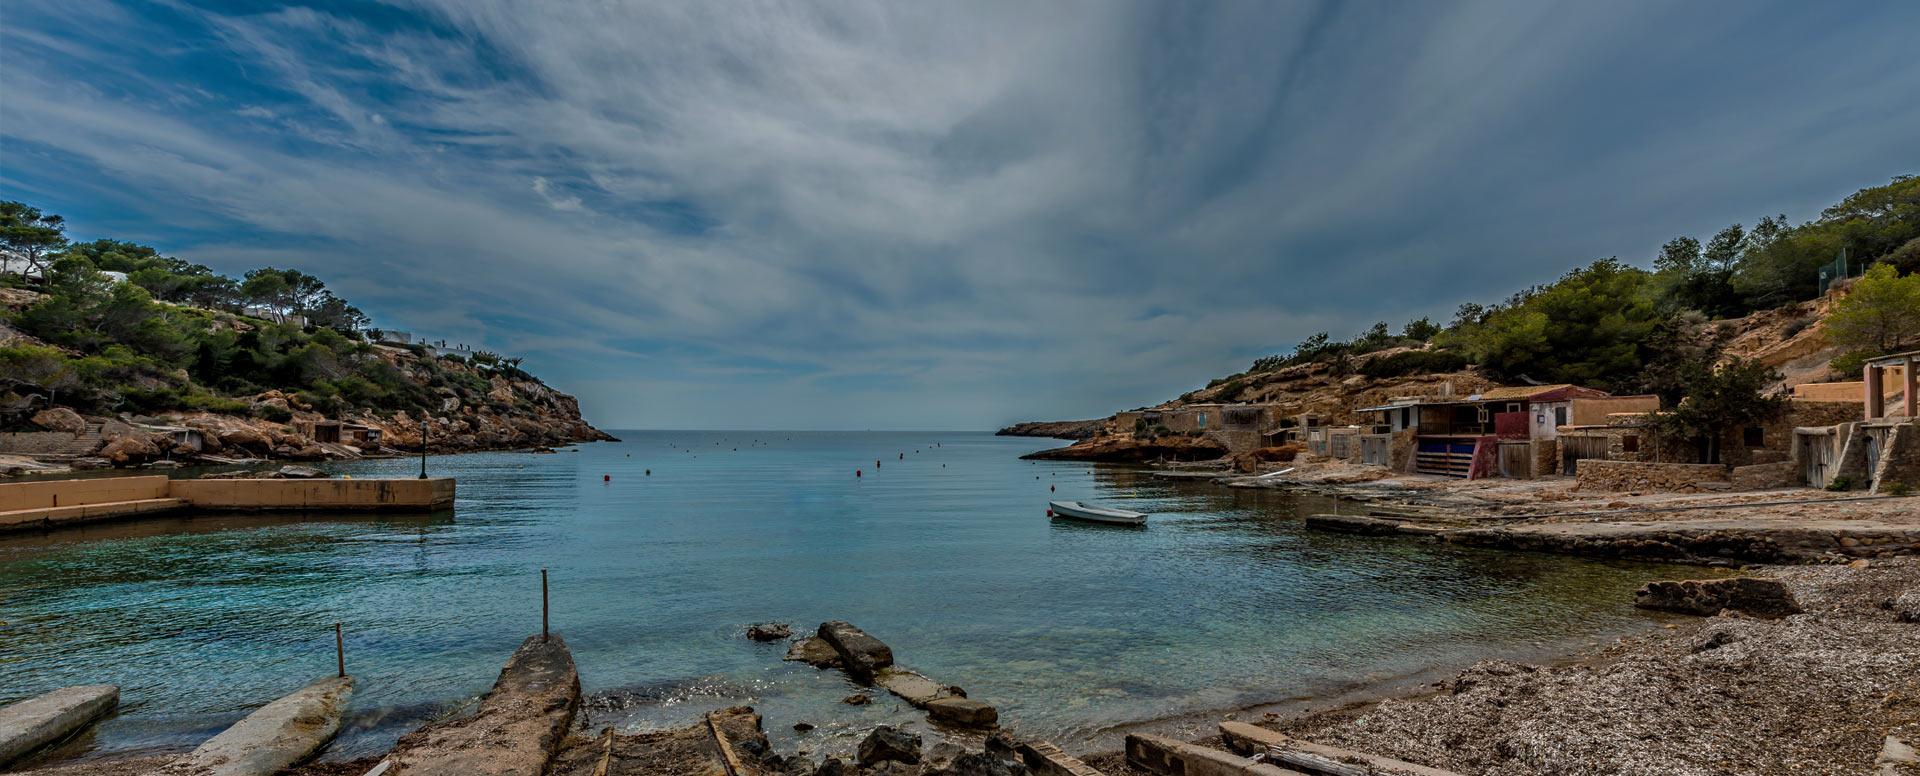 Evening delights - Ibiza